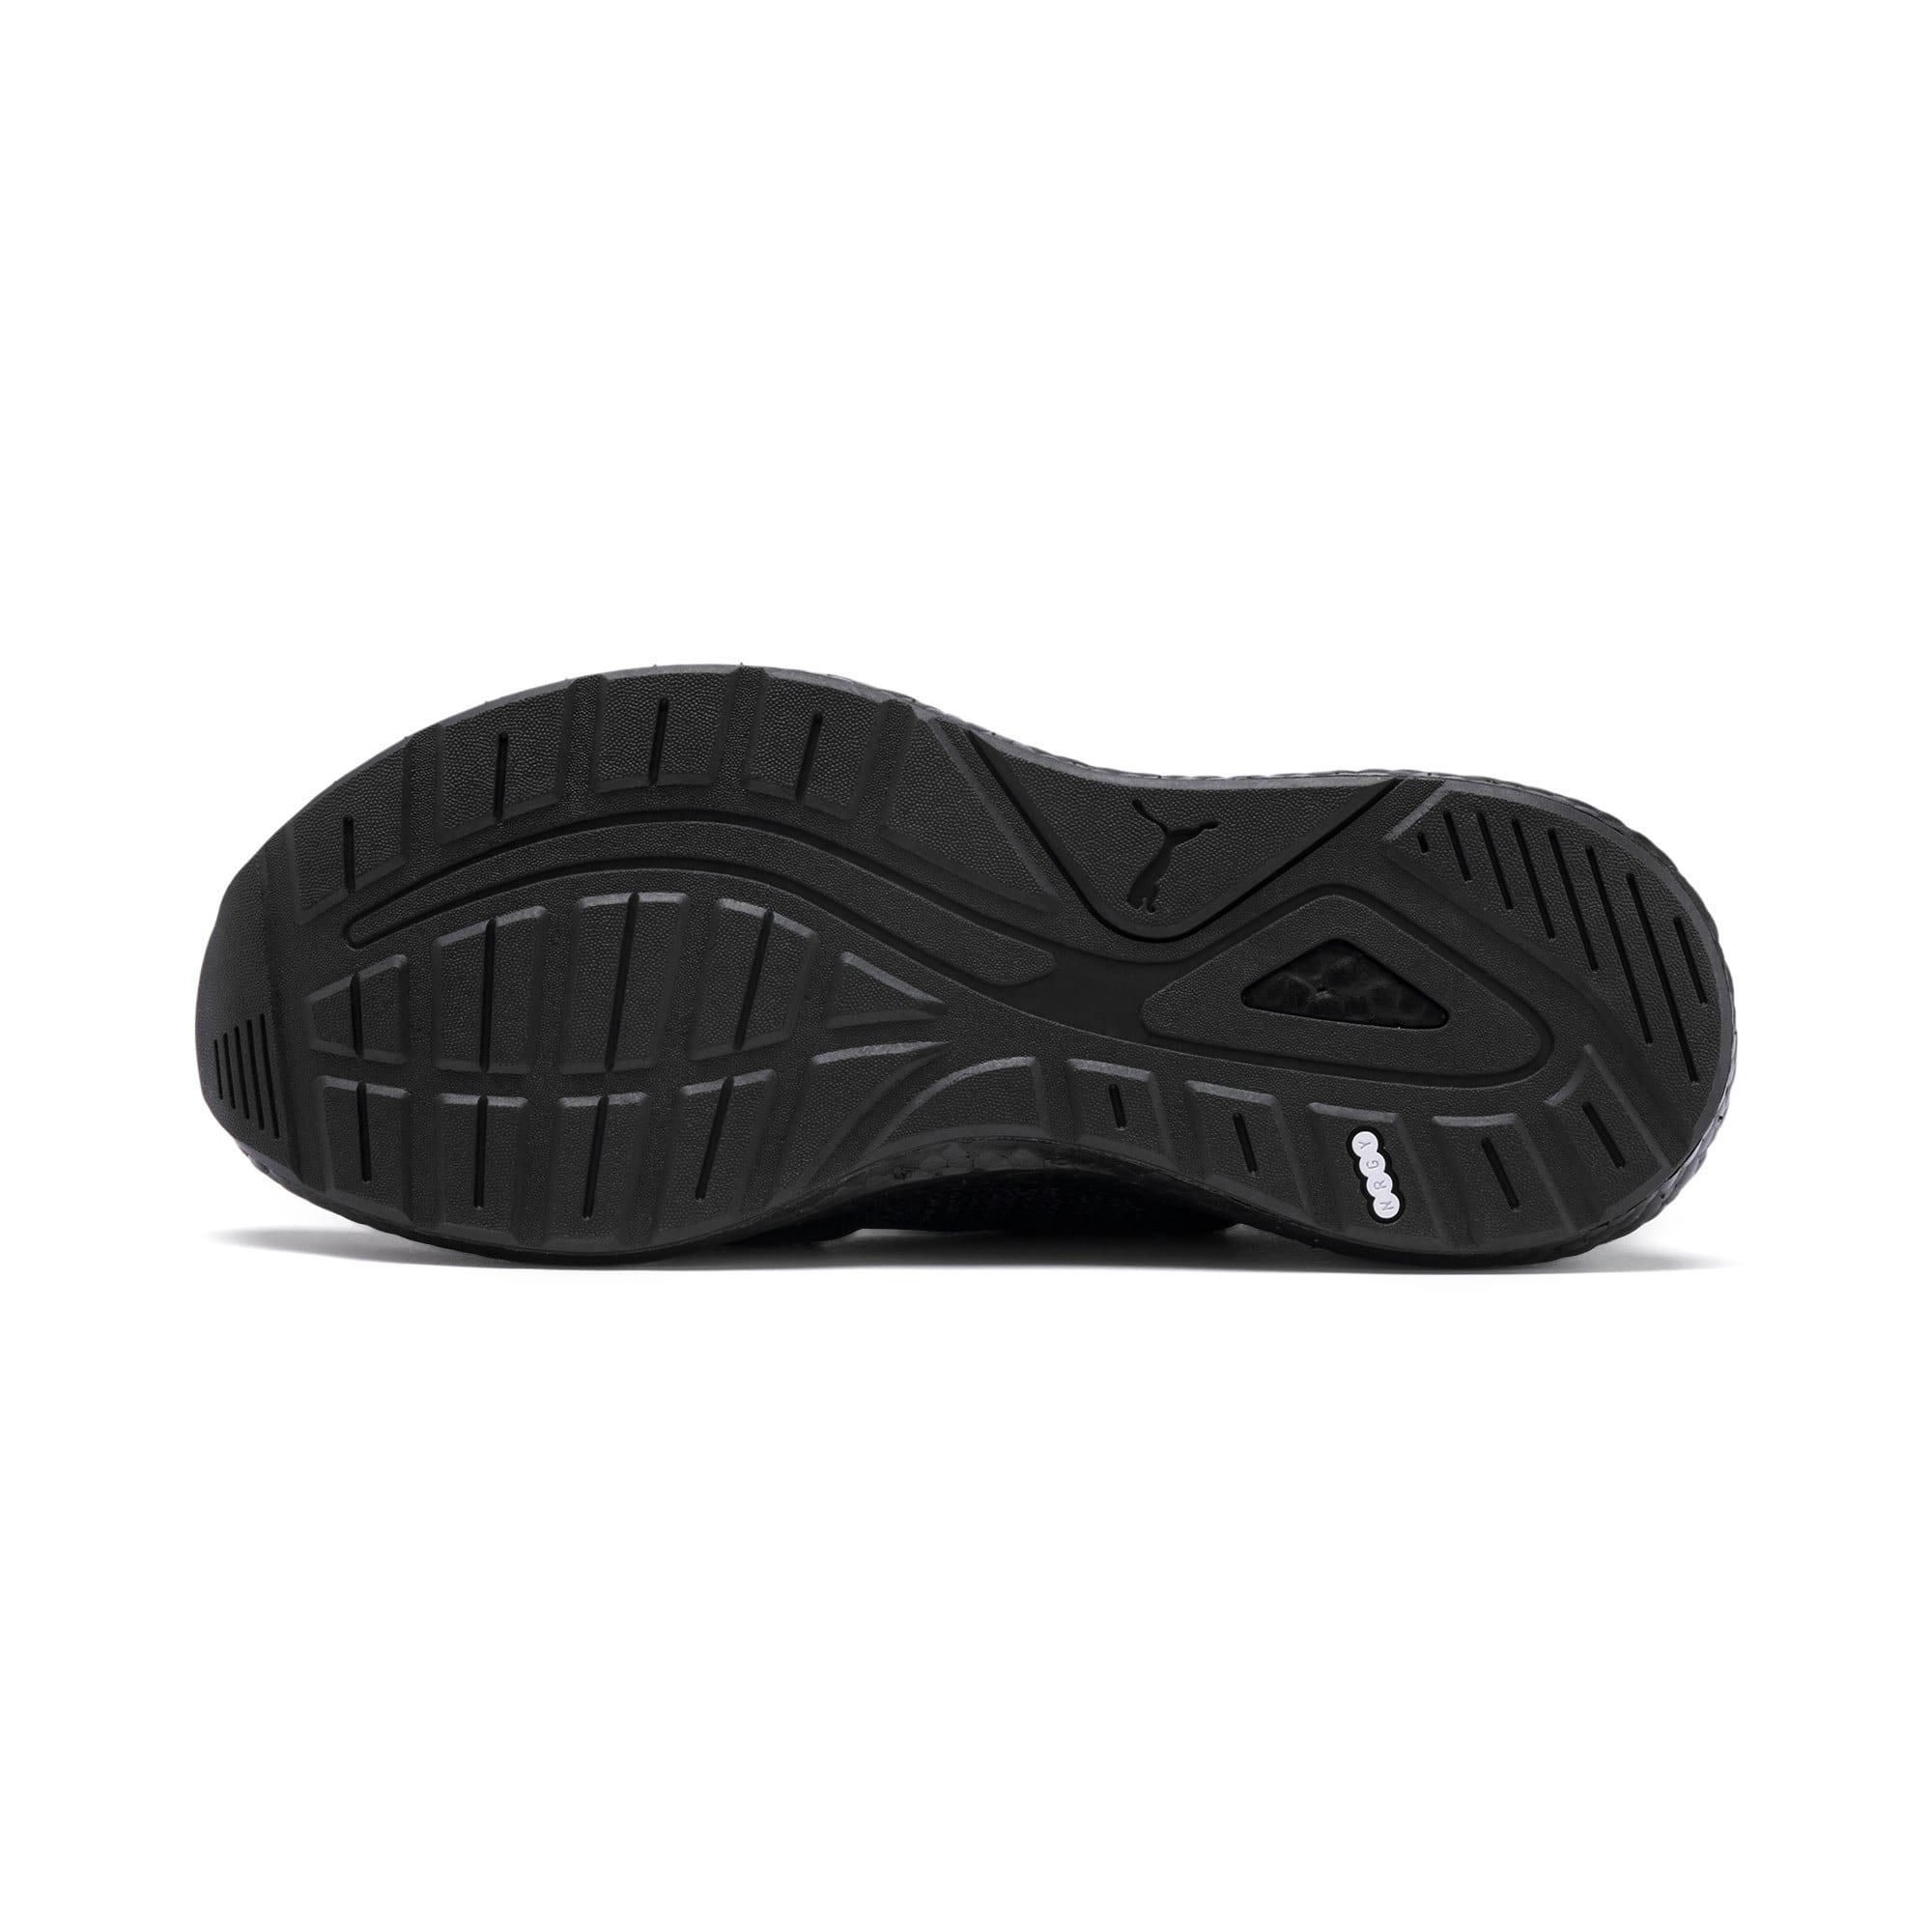 Thumbnail 5 of NRGY Neko Engineer Knit Women's Running Shoes, Puma Black-Puma Black, medium